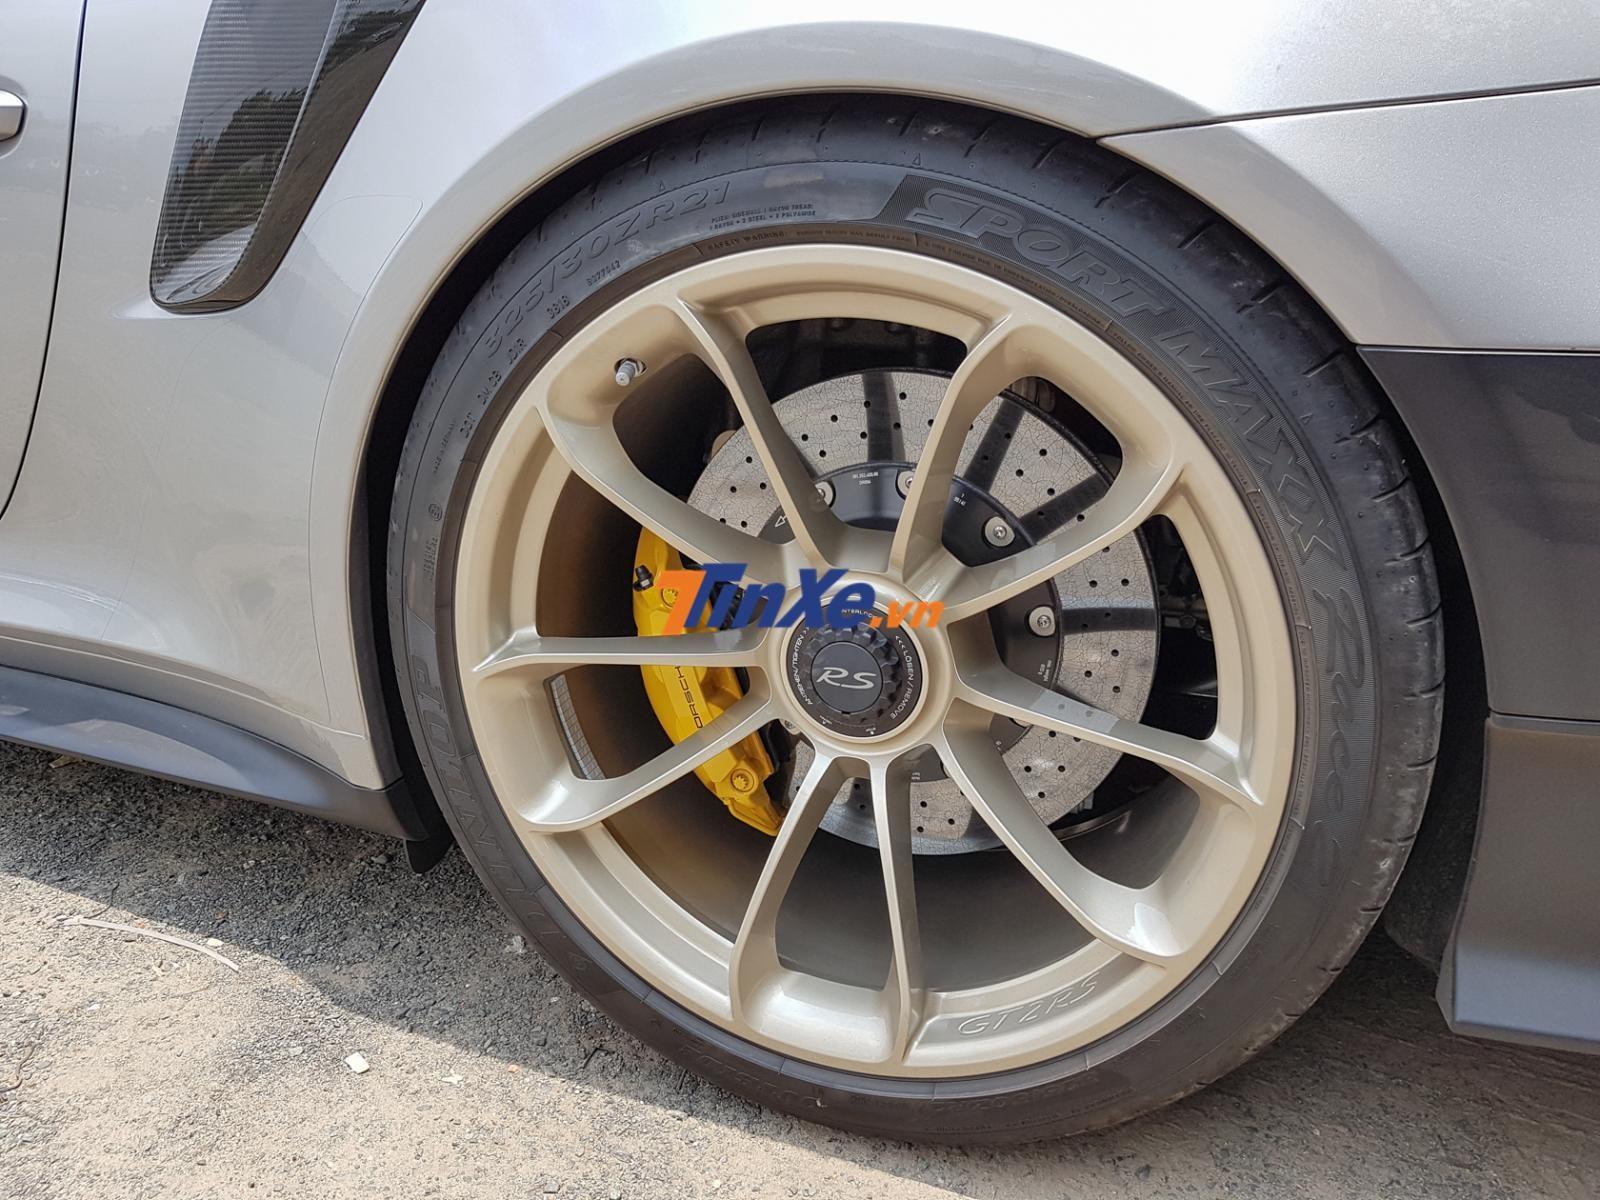 Vành ma-giê của Porsche 911 GT2 RS Weisach